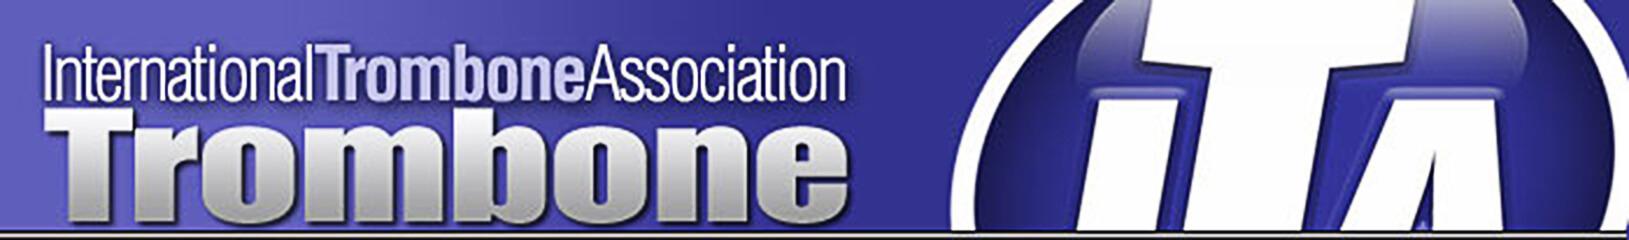 International Trombone Association